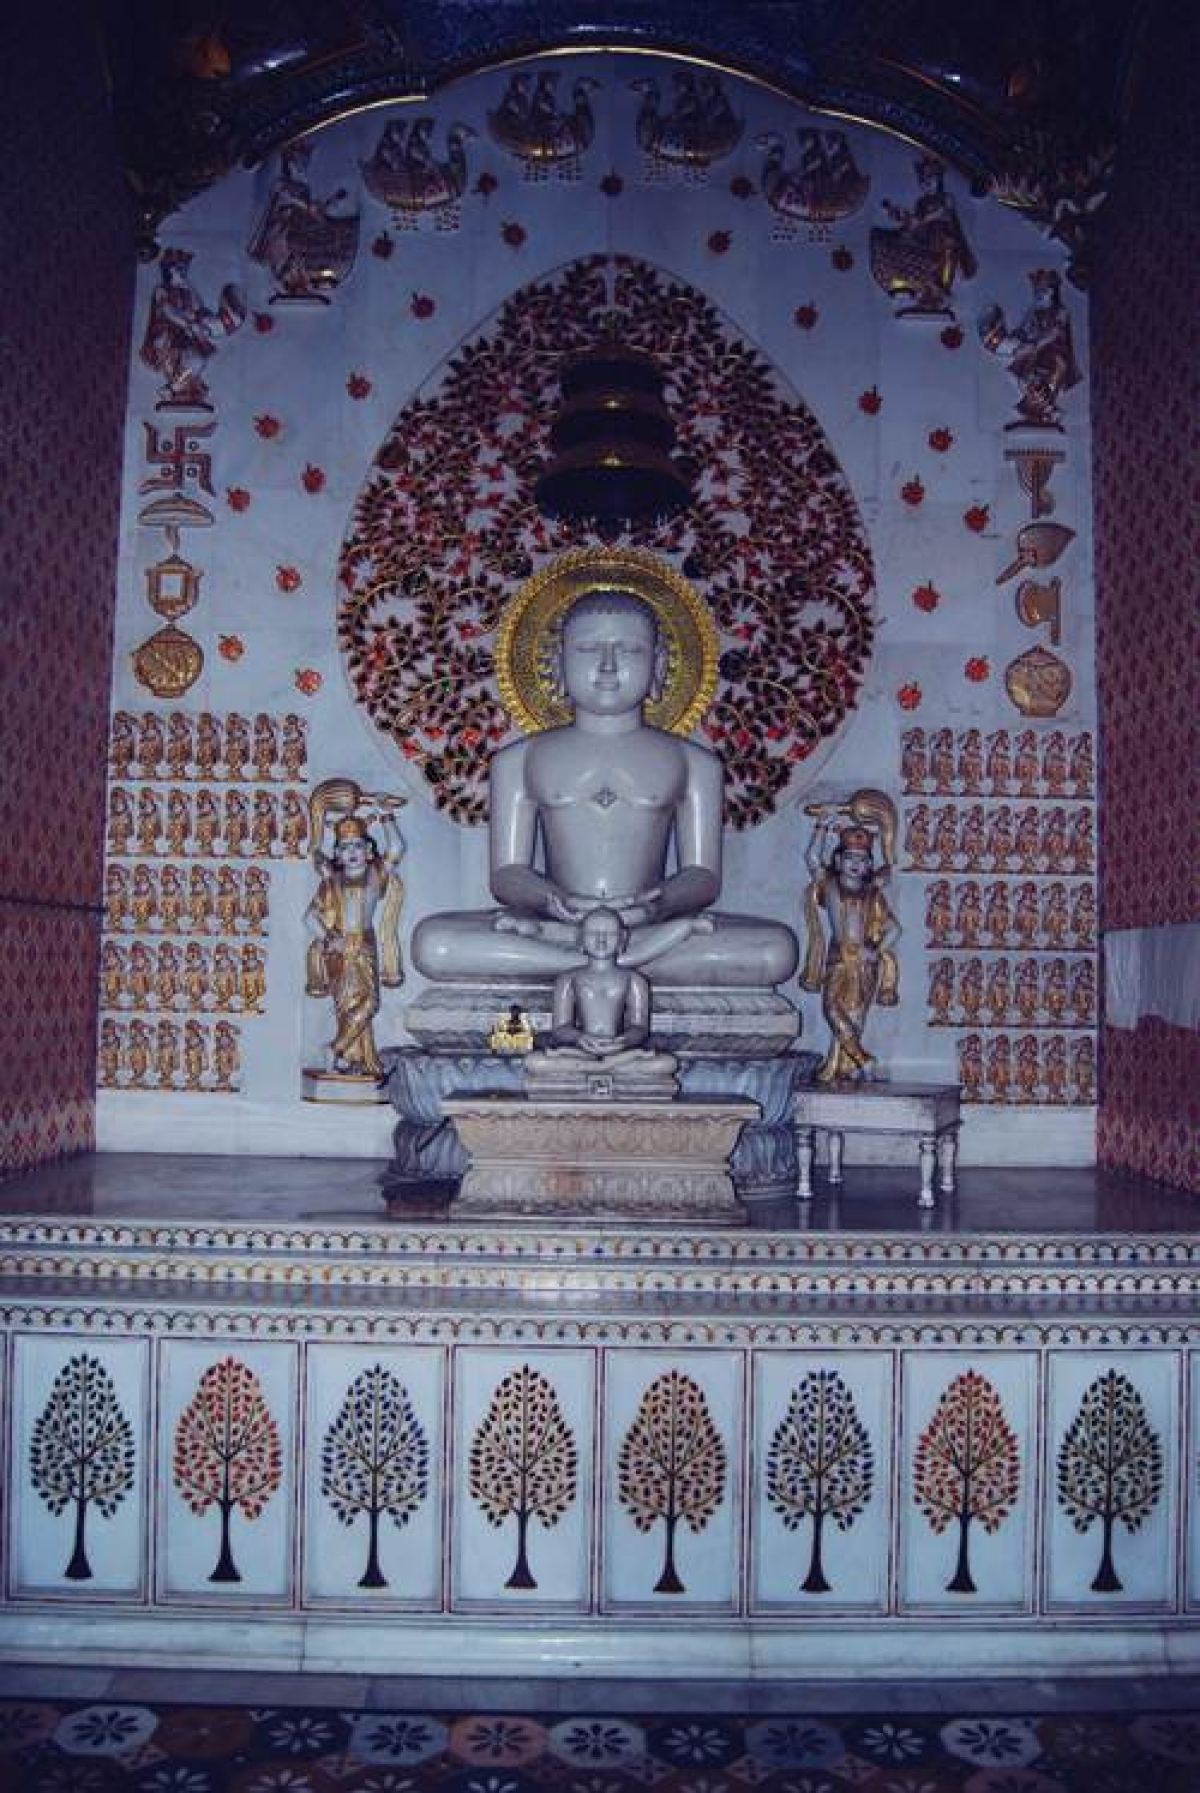 The Rishabhdeo idol at the Nasiyan Digambar Jain Temple. Photo by Shaili Shah